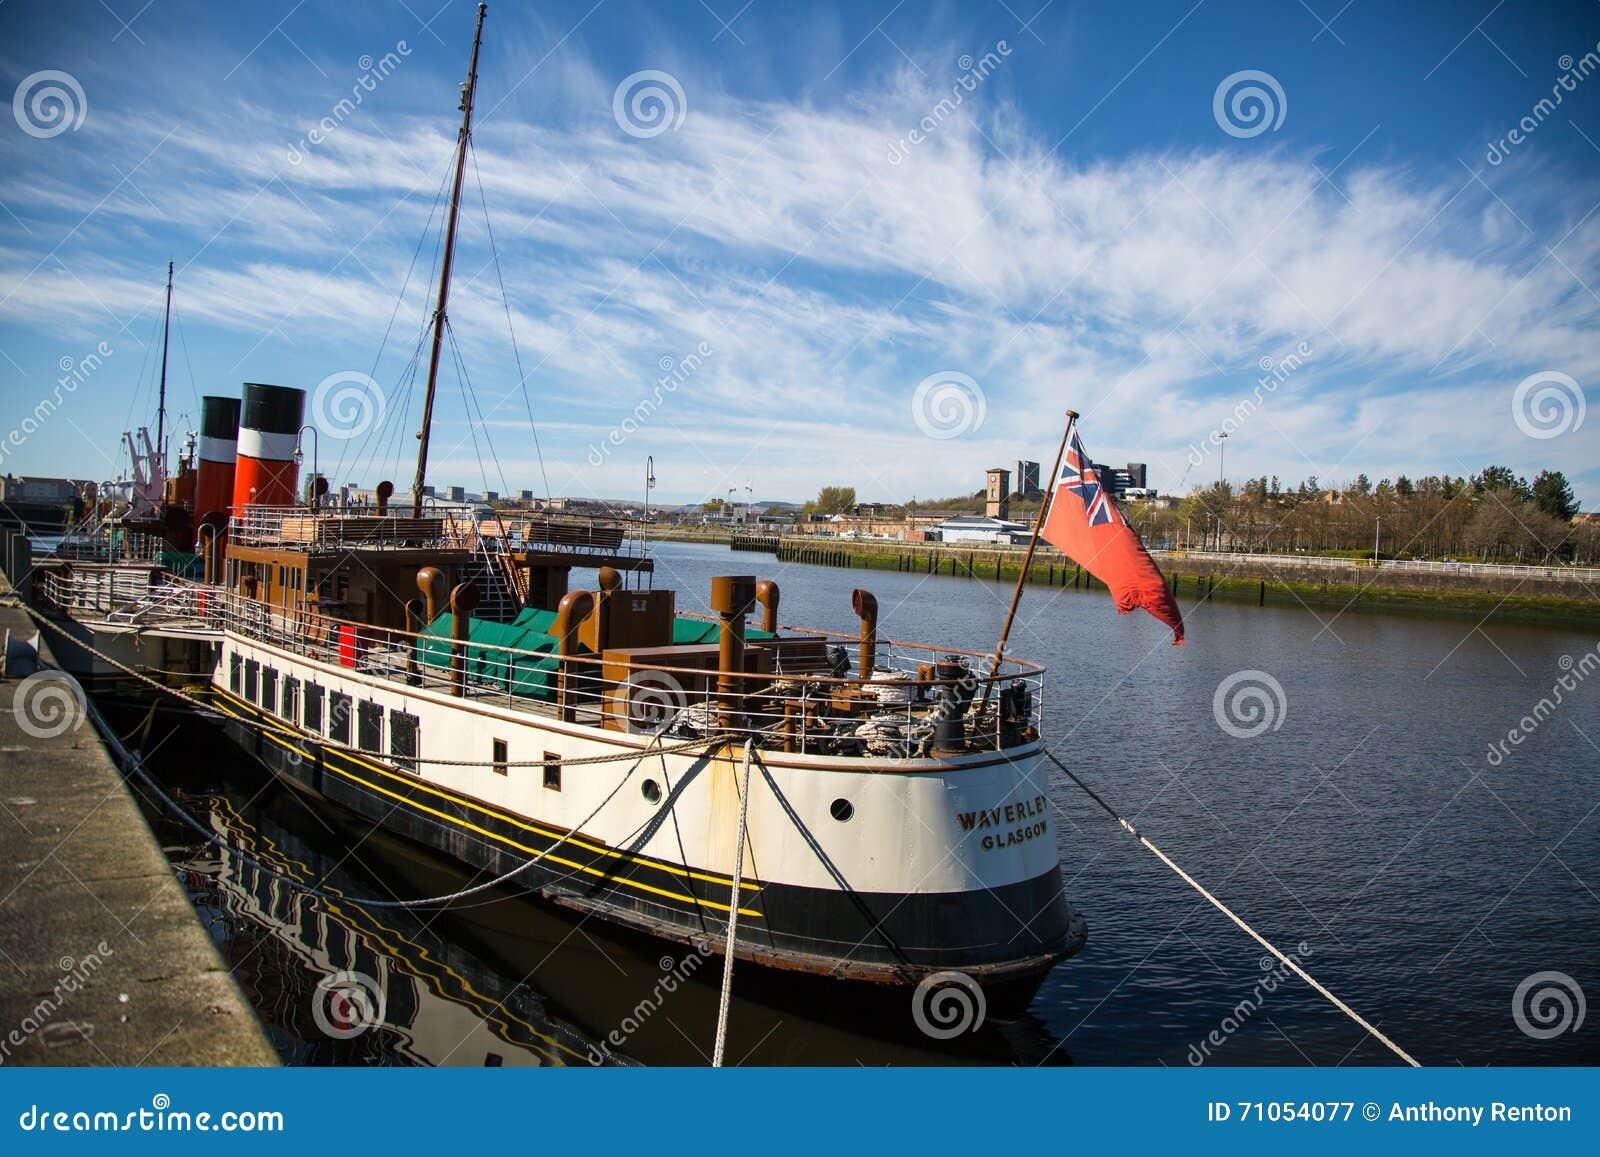 Waverley στο Clydeside, Γλασκώβη, Σκωτία, UK